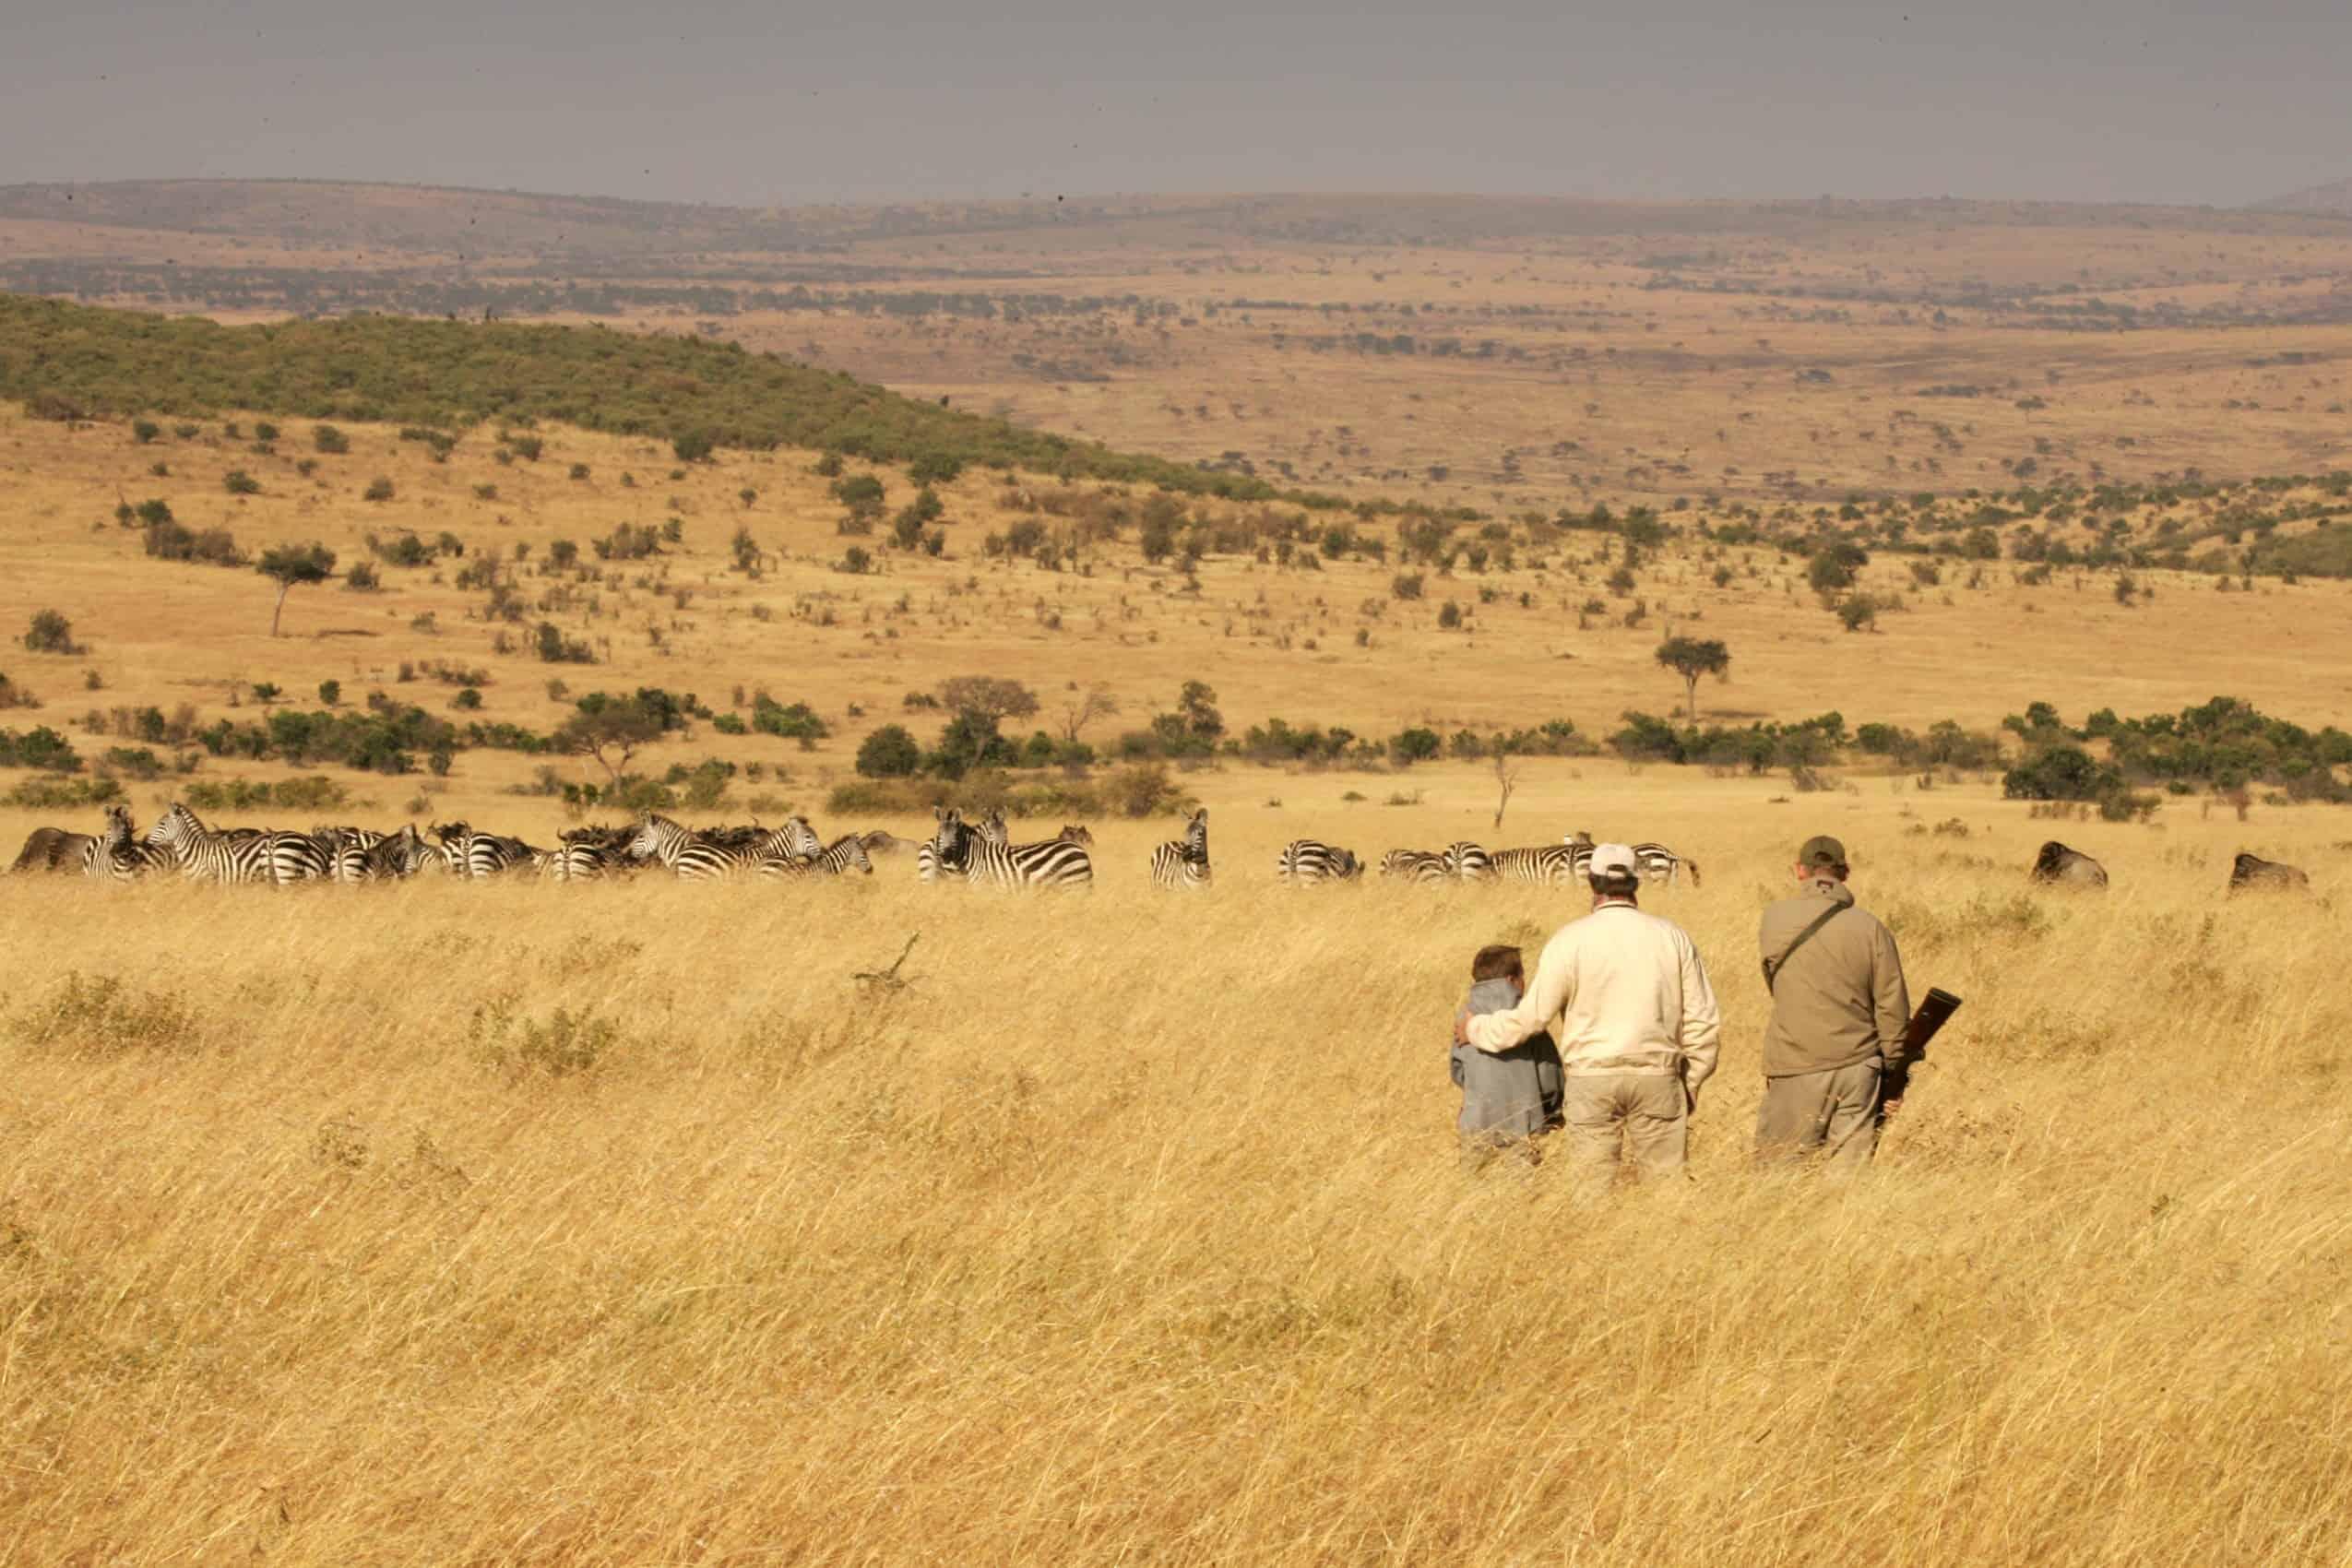 TOP BEST LUXURY SAFARI CAMPS IN AFRICA - 10 best safaris in africa